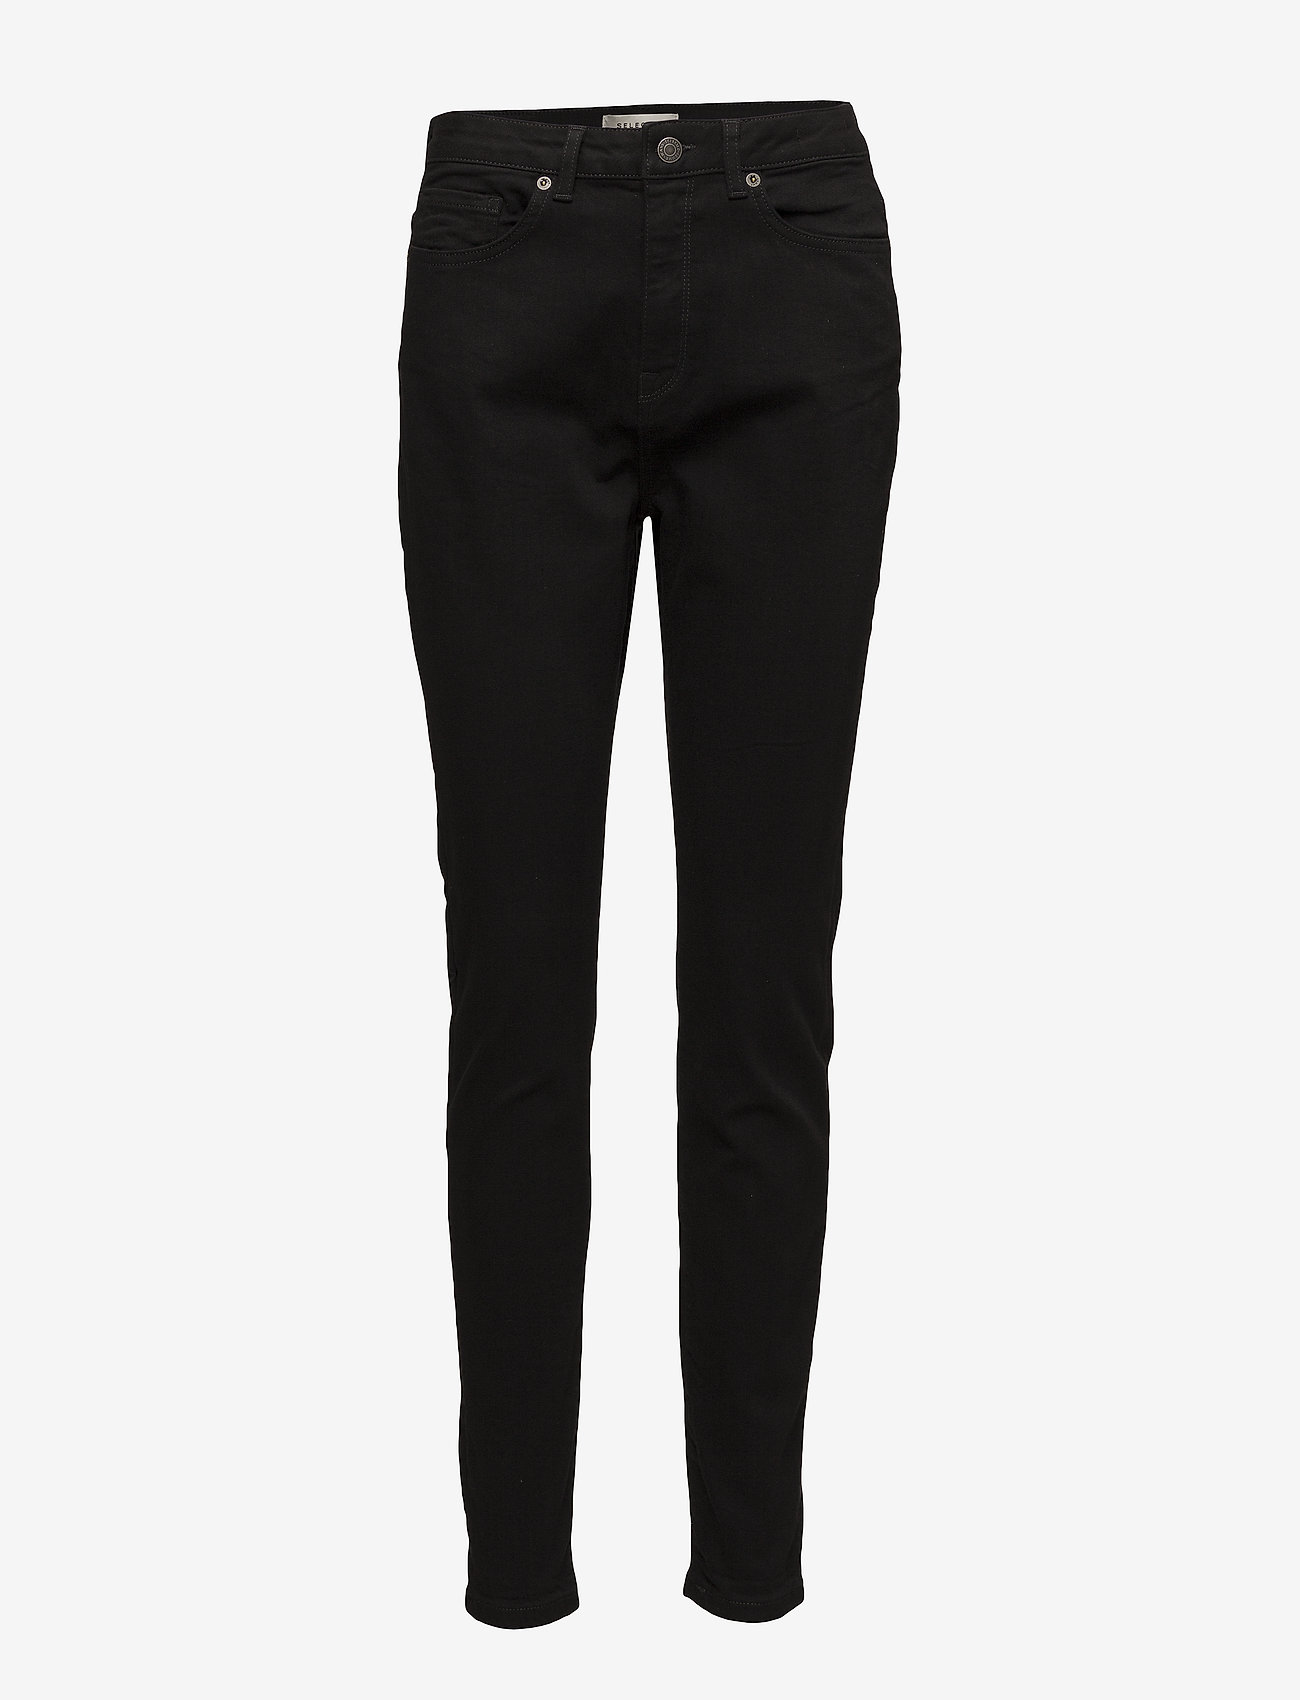 Selected Femme - SLFMAGGIE HW SKINNY BLACK JEANS W NOOS - pillihousut - black - 0